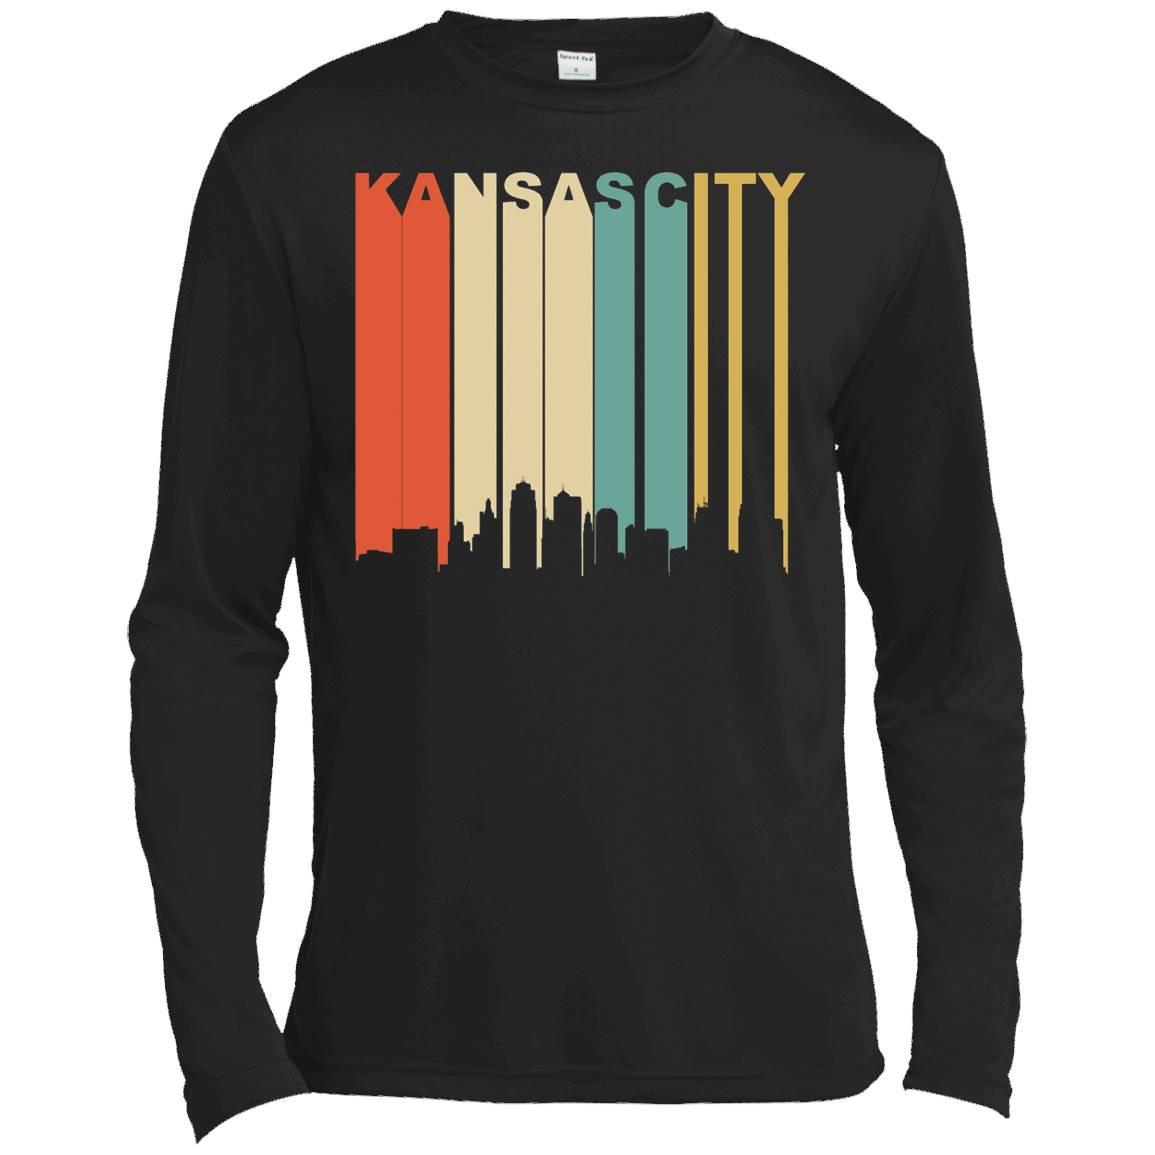 Retro 1970's Kansas City Missouri Downtown Skyline T-Shirt – Long Sleeve Tee